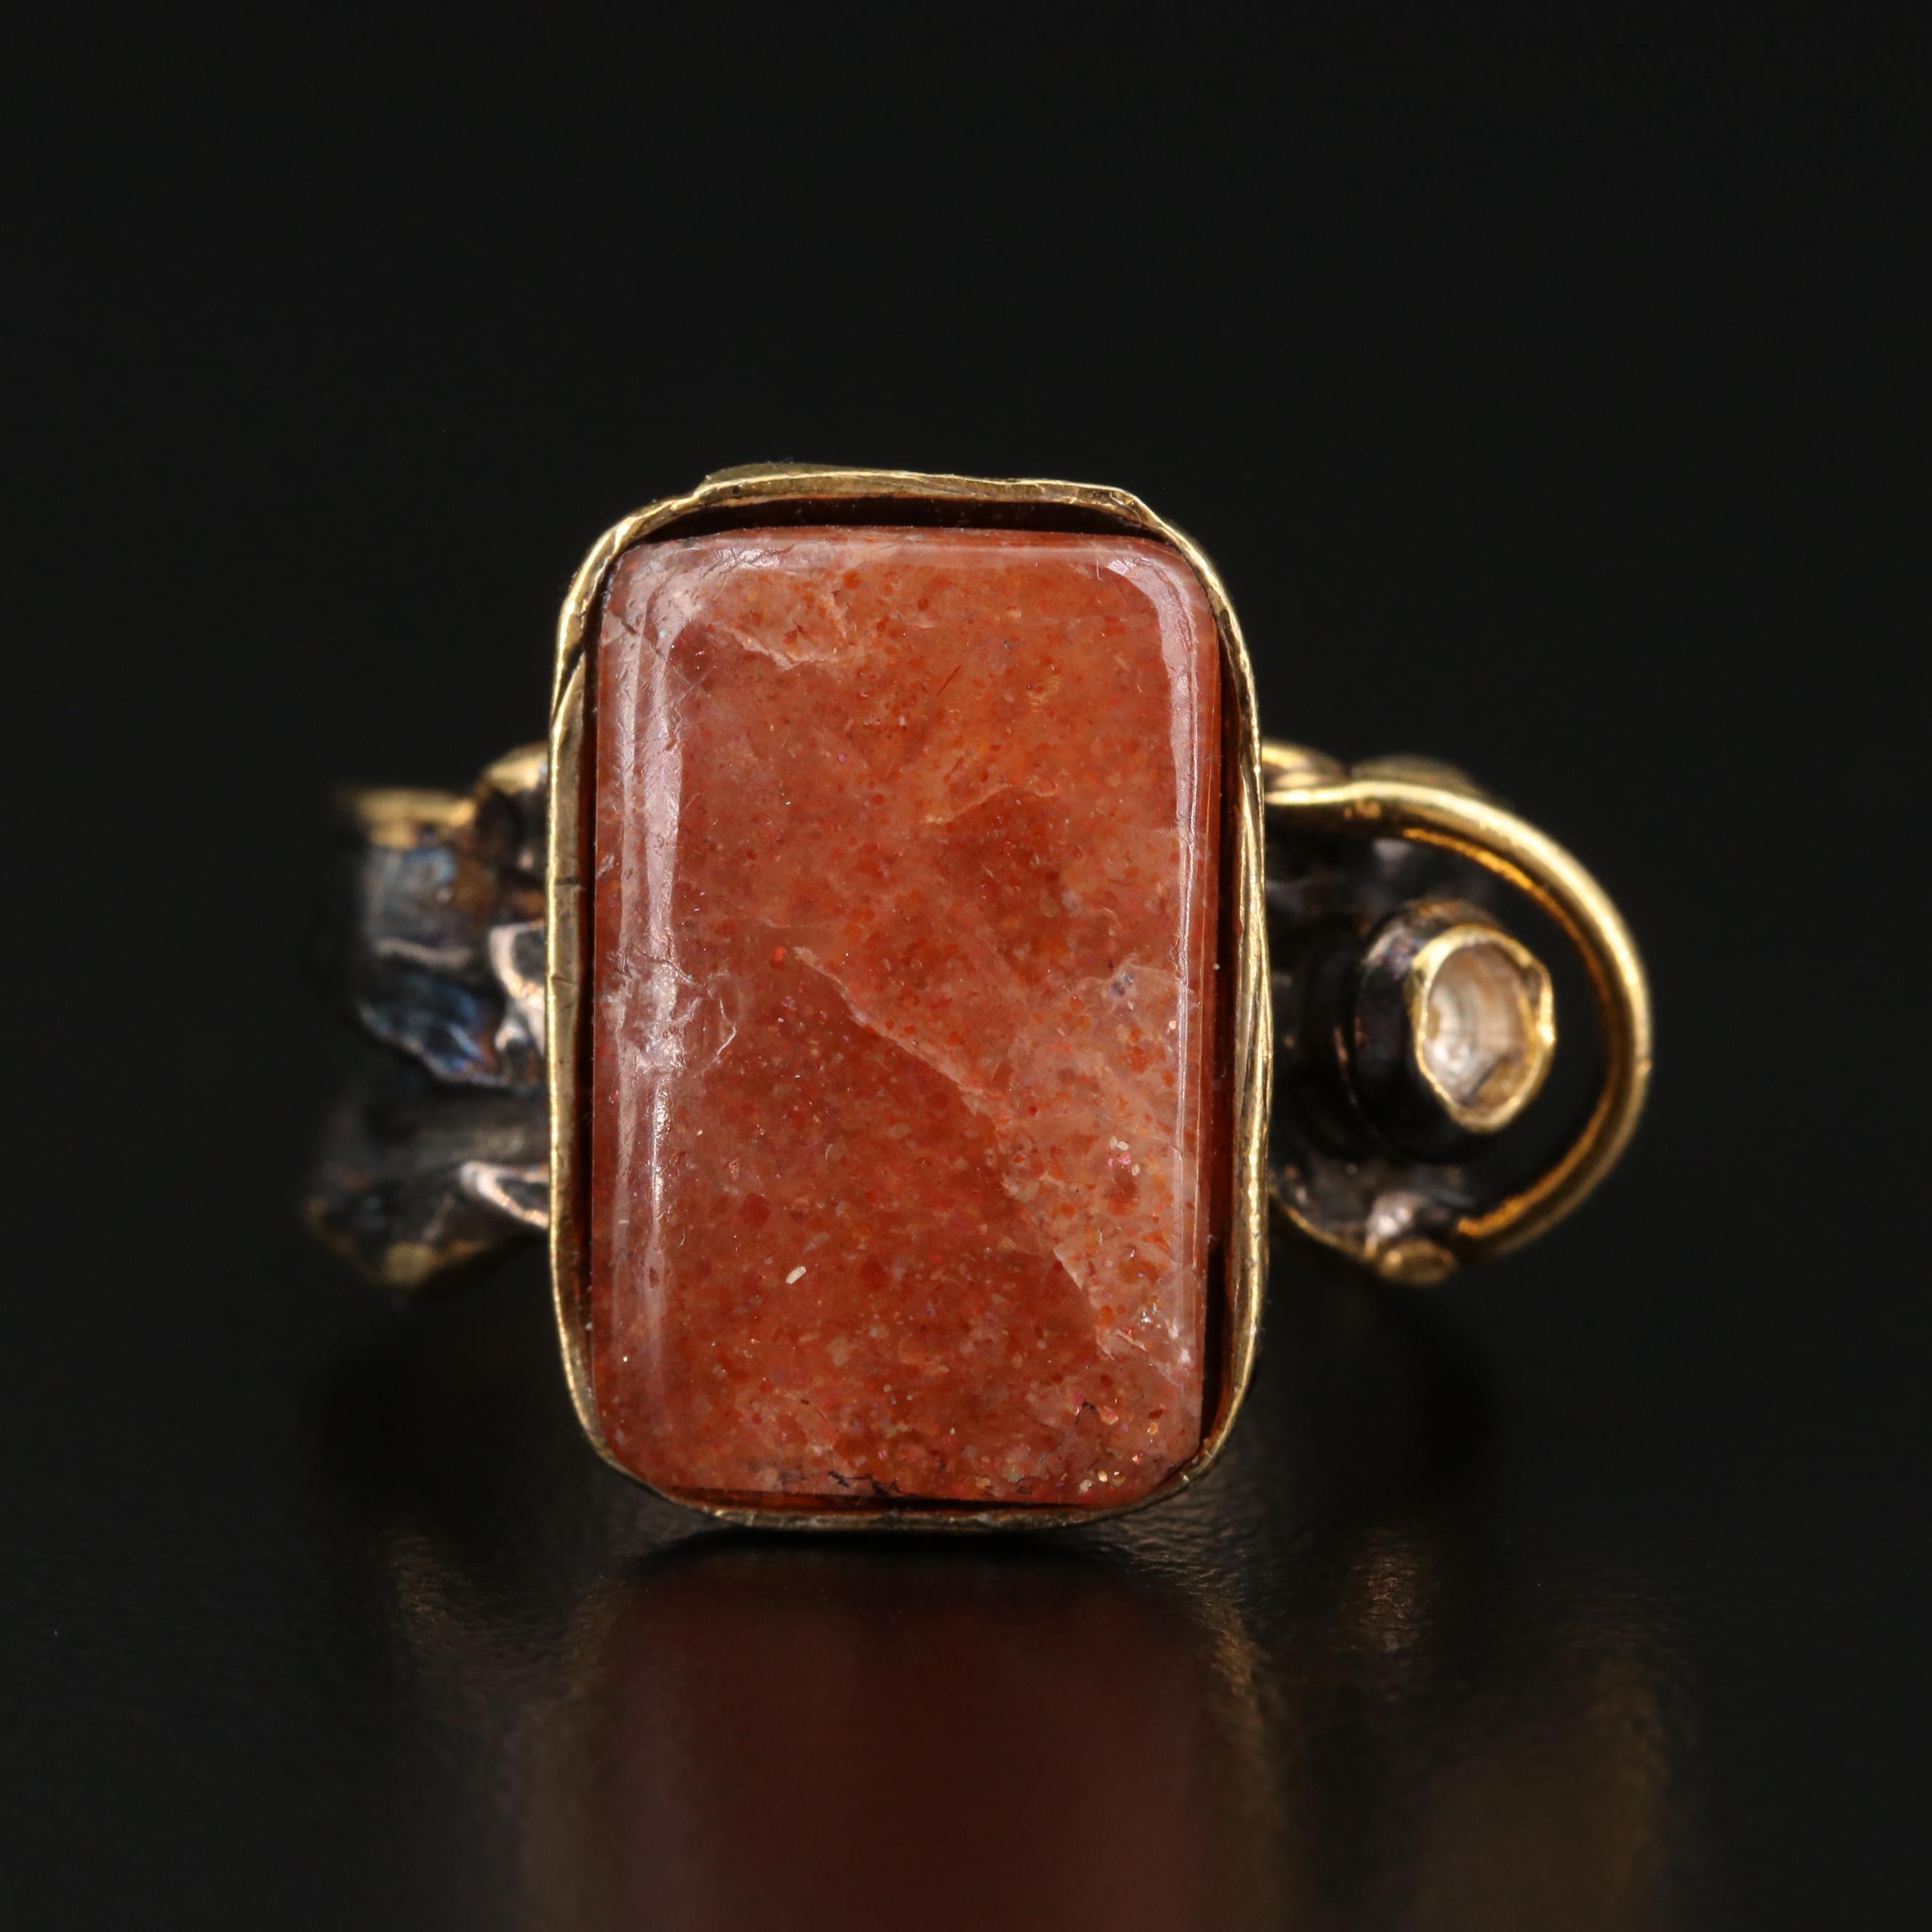 Large Faceted Sunstone Sterling Silver Ring One of a Kind Shimmering Sunshine Sacral Chakra Creative Energy Joyful Uplifting Gemstone